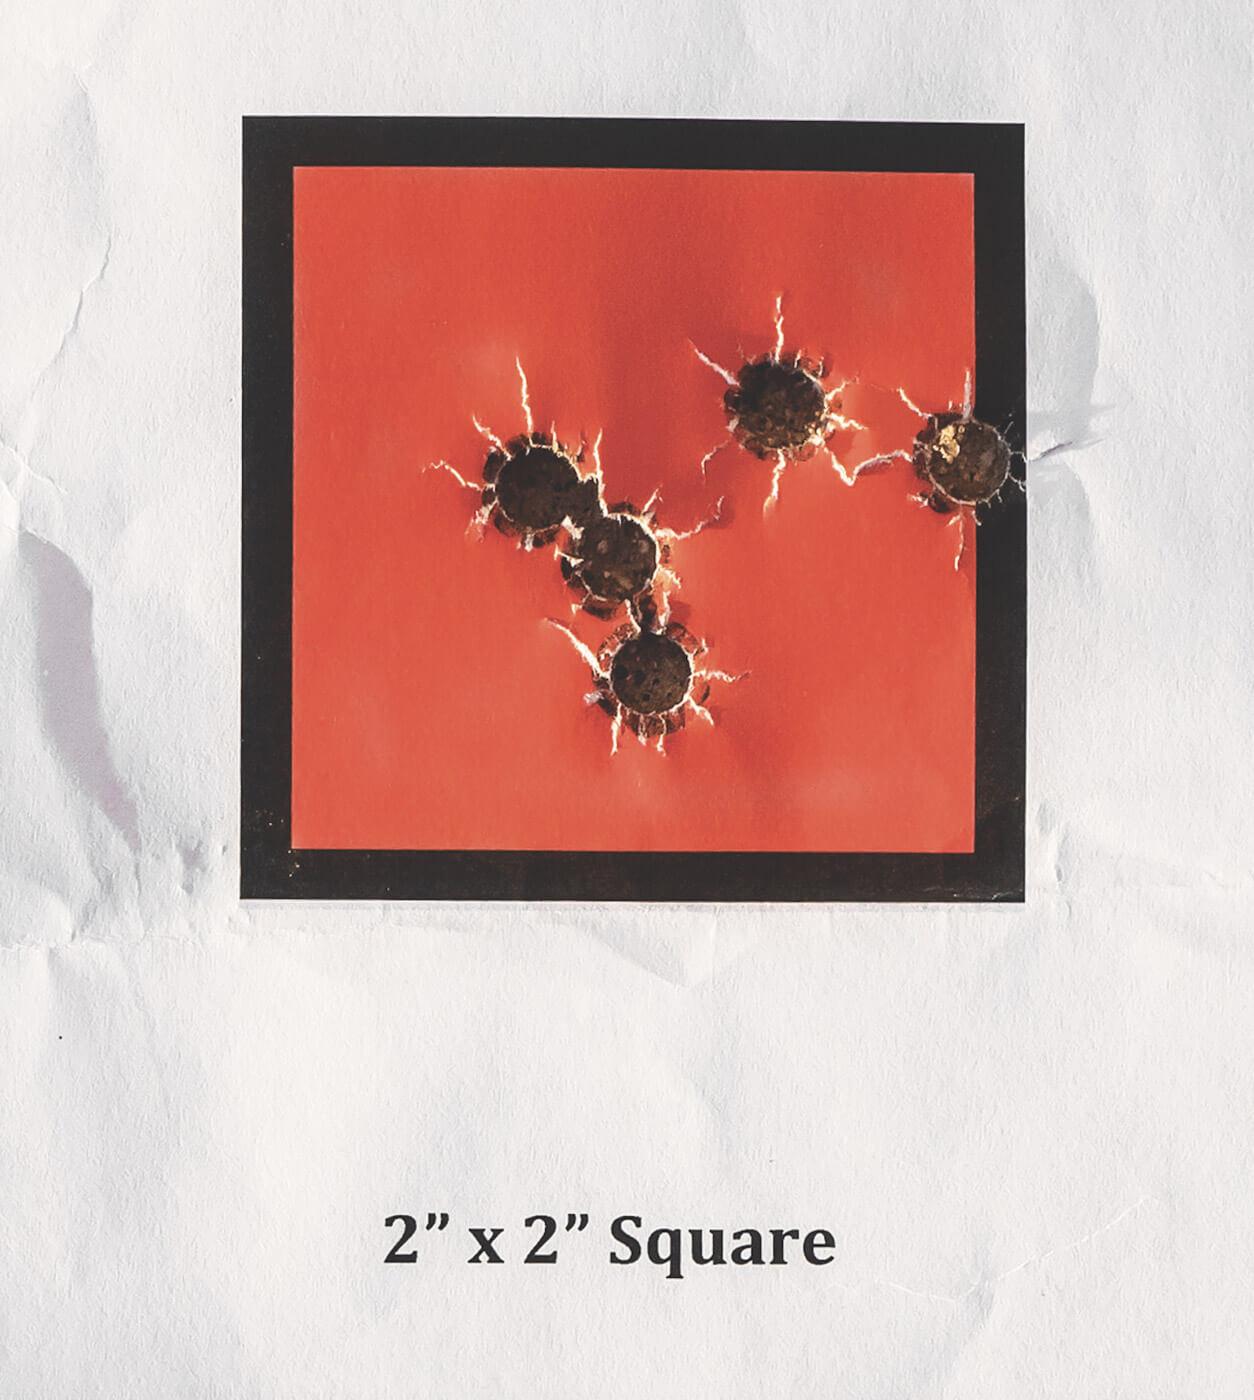 Five shot group on target